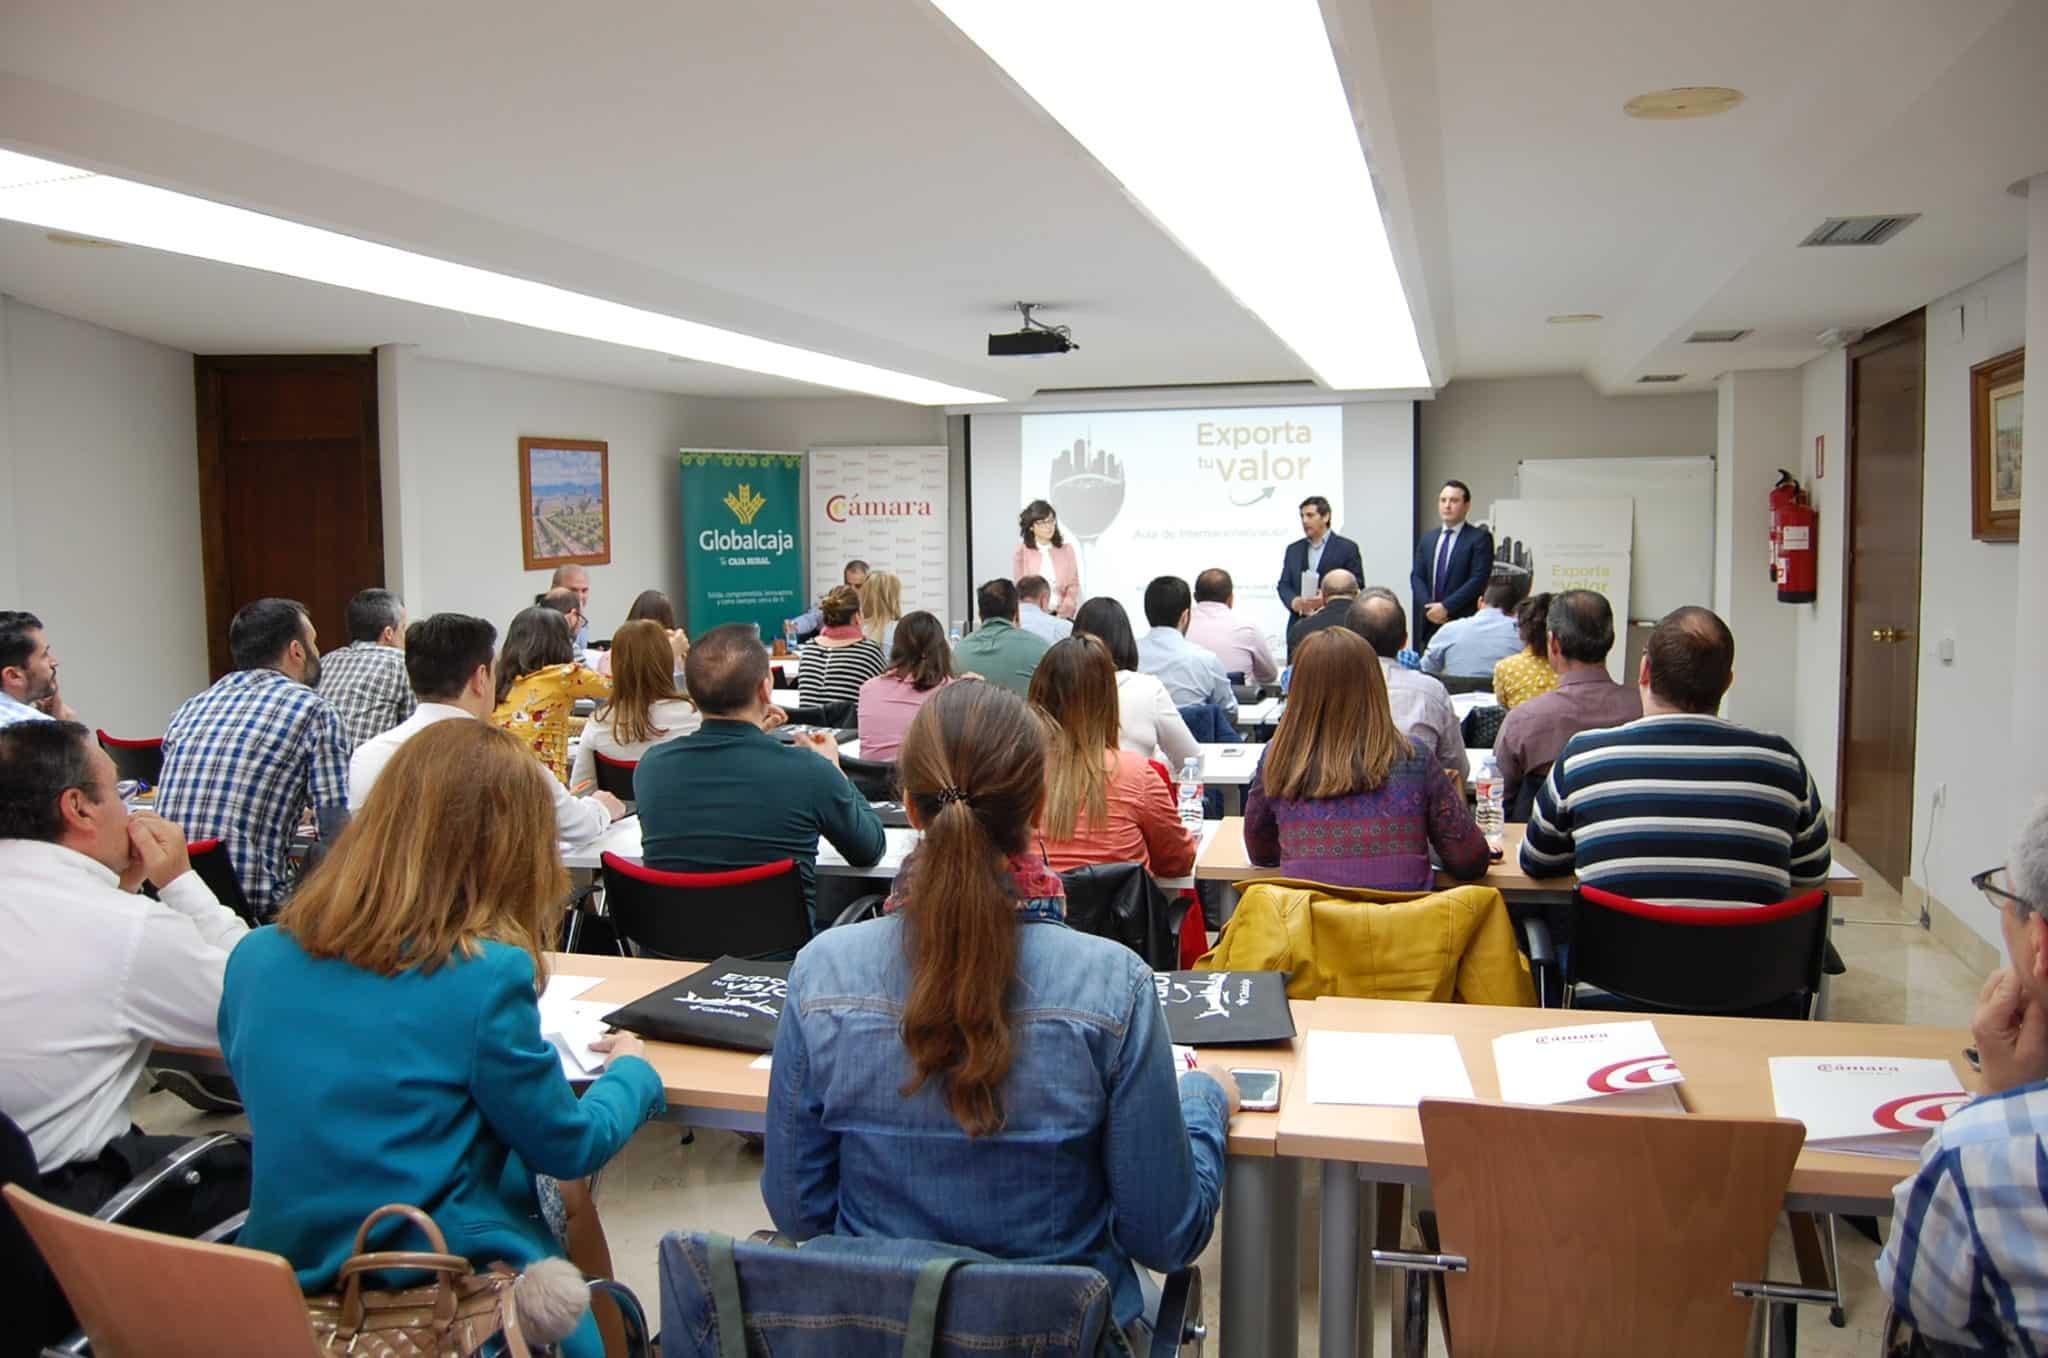 https://blog.globalcaja.es/wp-content/uploads/2018/04/aula-internacional-CR.jpg